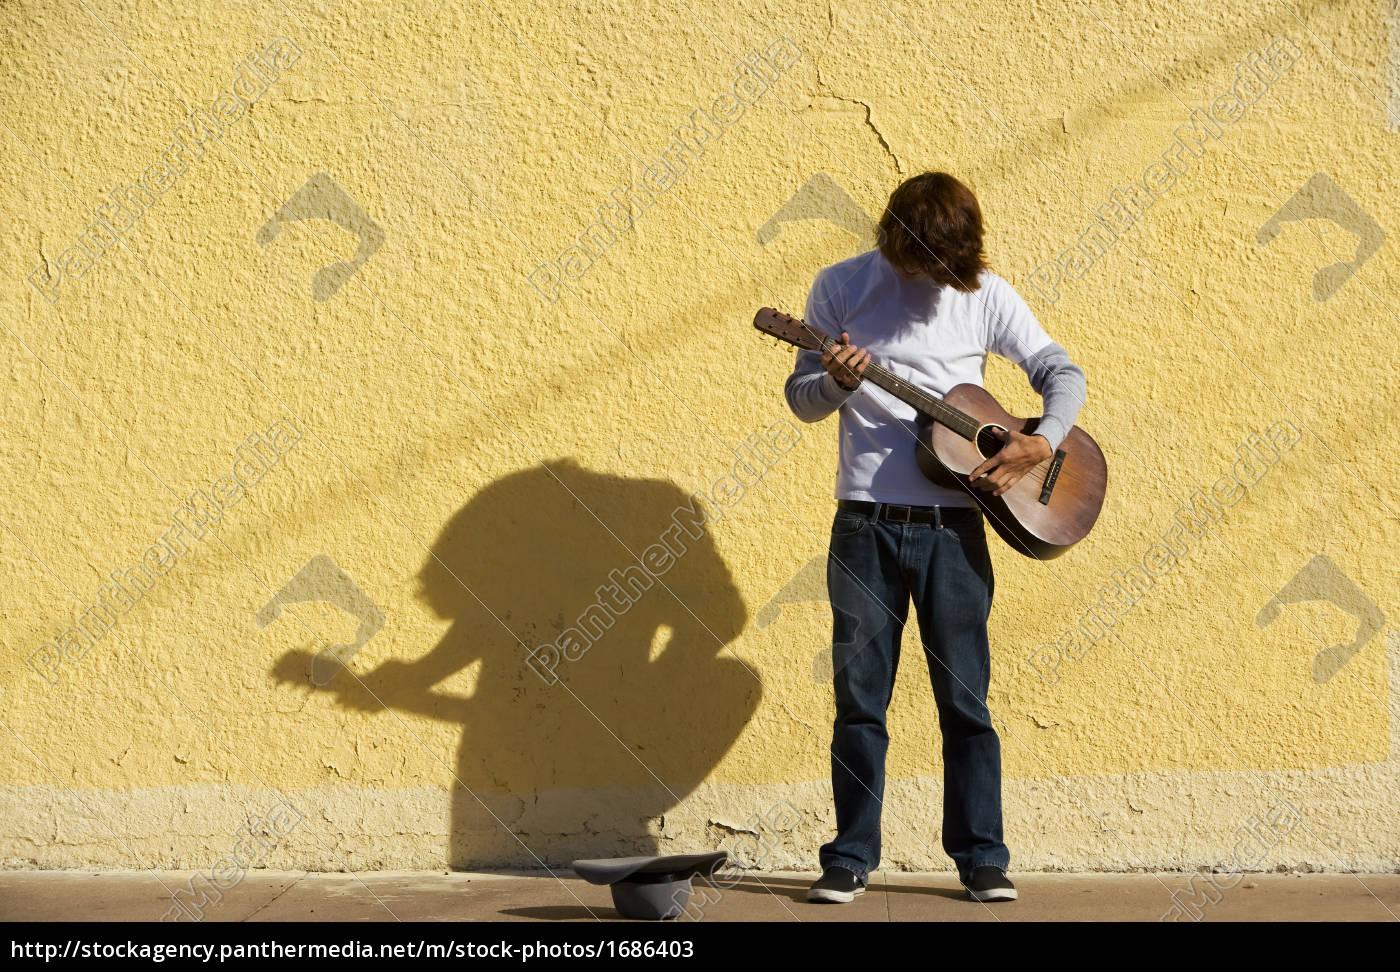 music, male, masculine, musician, guitar, sidewalk - 1686403